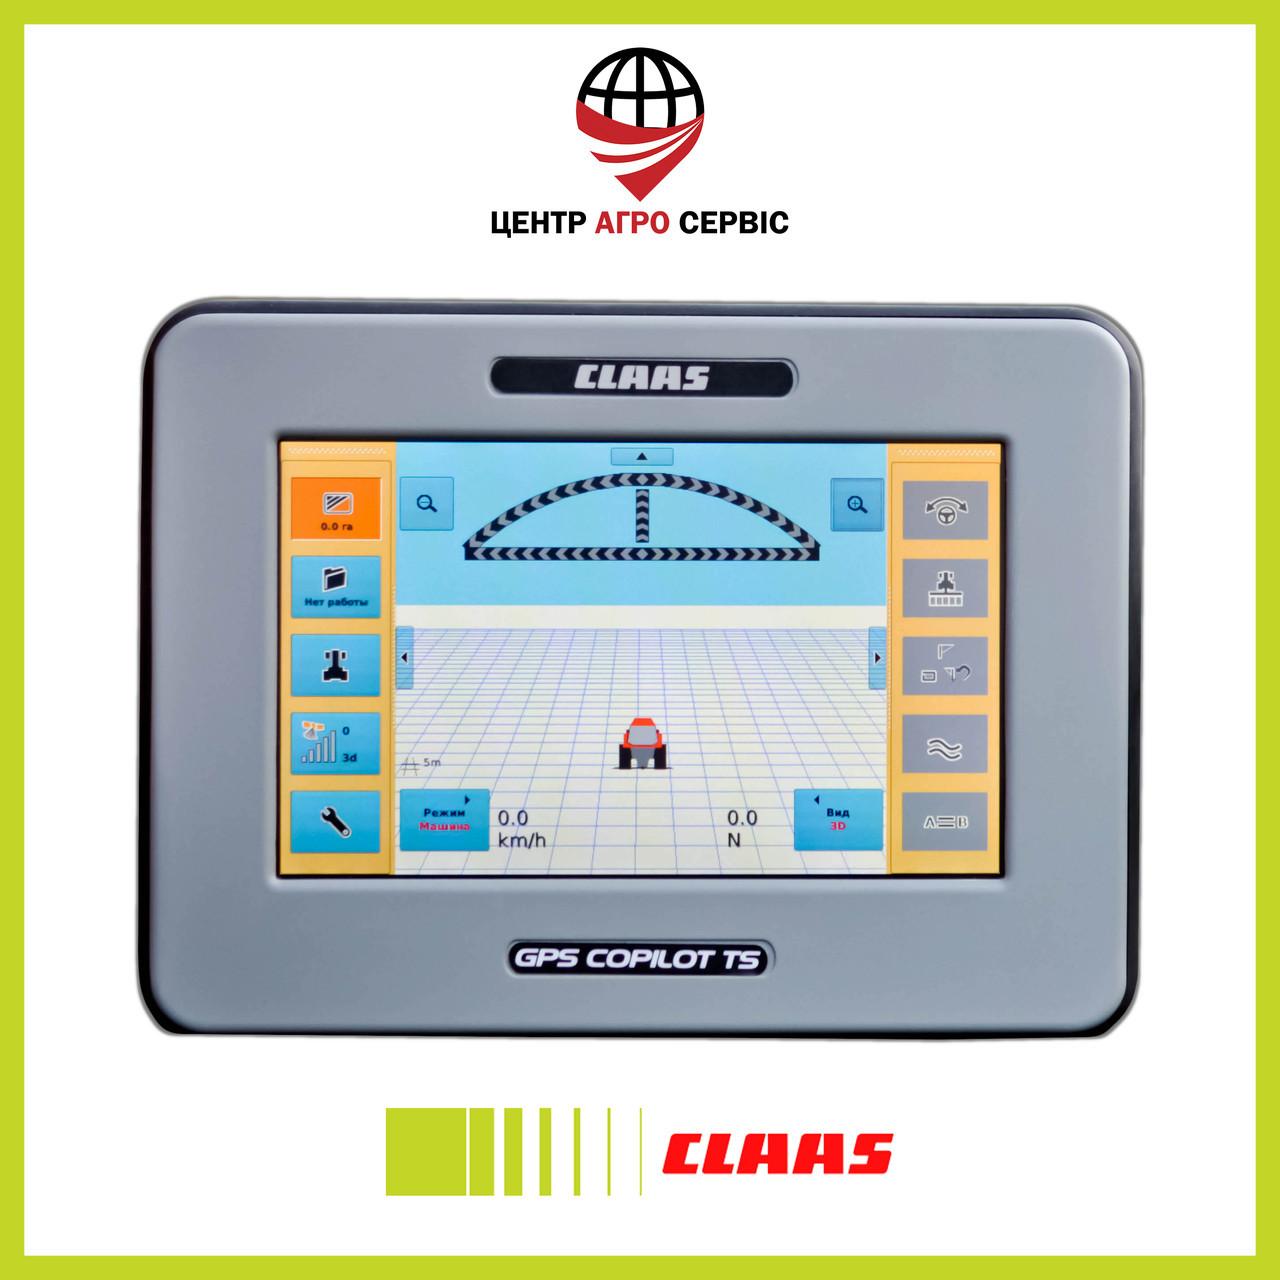 Gps навигатор для трактора (навигатор для поля, сельхоз навигатор)  CLAAS gps copilot TS